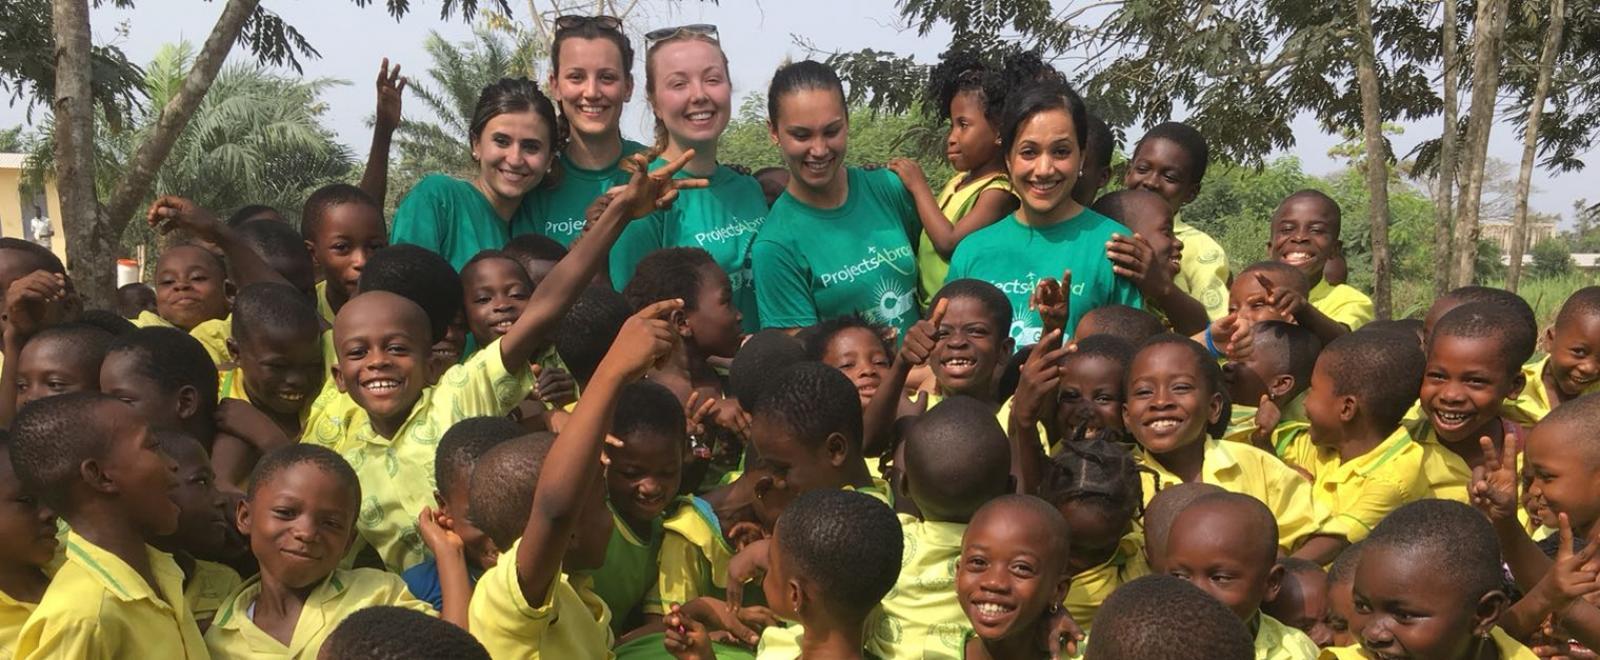 Medical volunteers working with children in Ghana